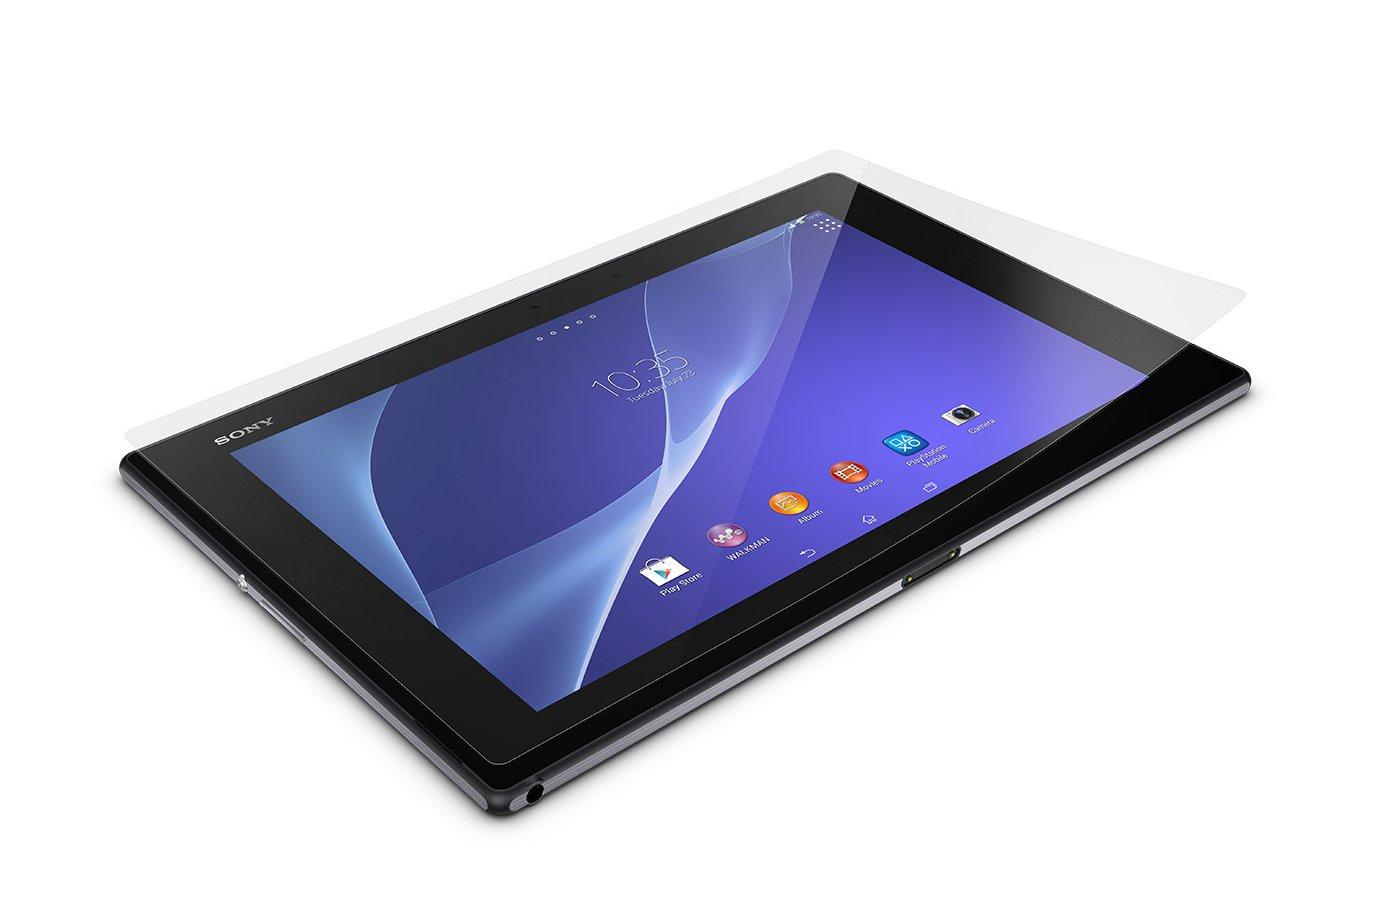 Защитная пленка SONY ET974 Оригинальная защитная пленка для Xperia Z2 Tablet